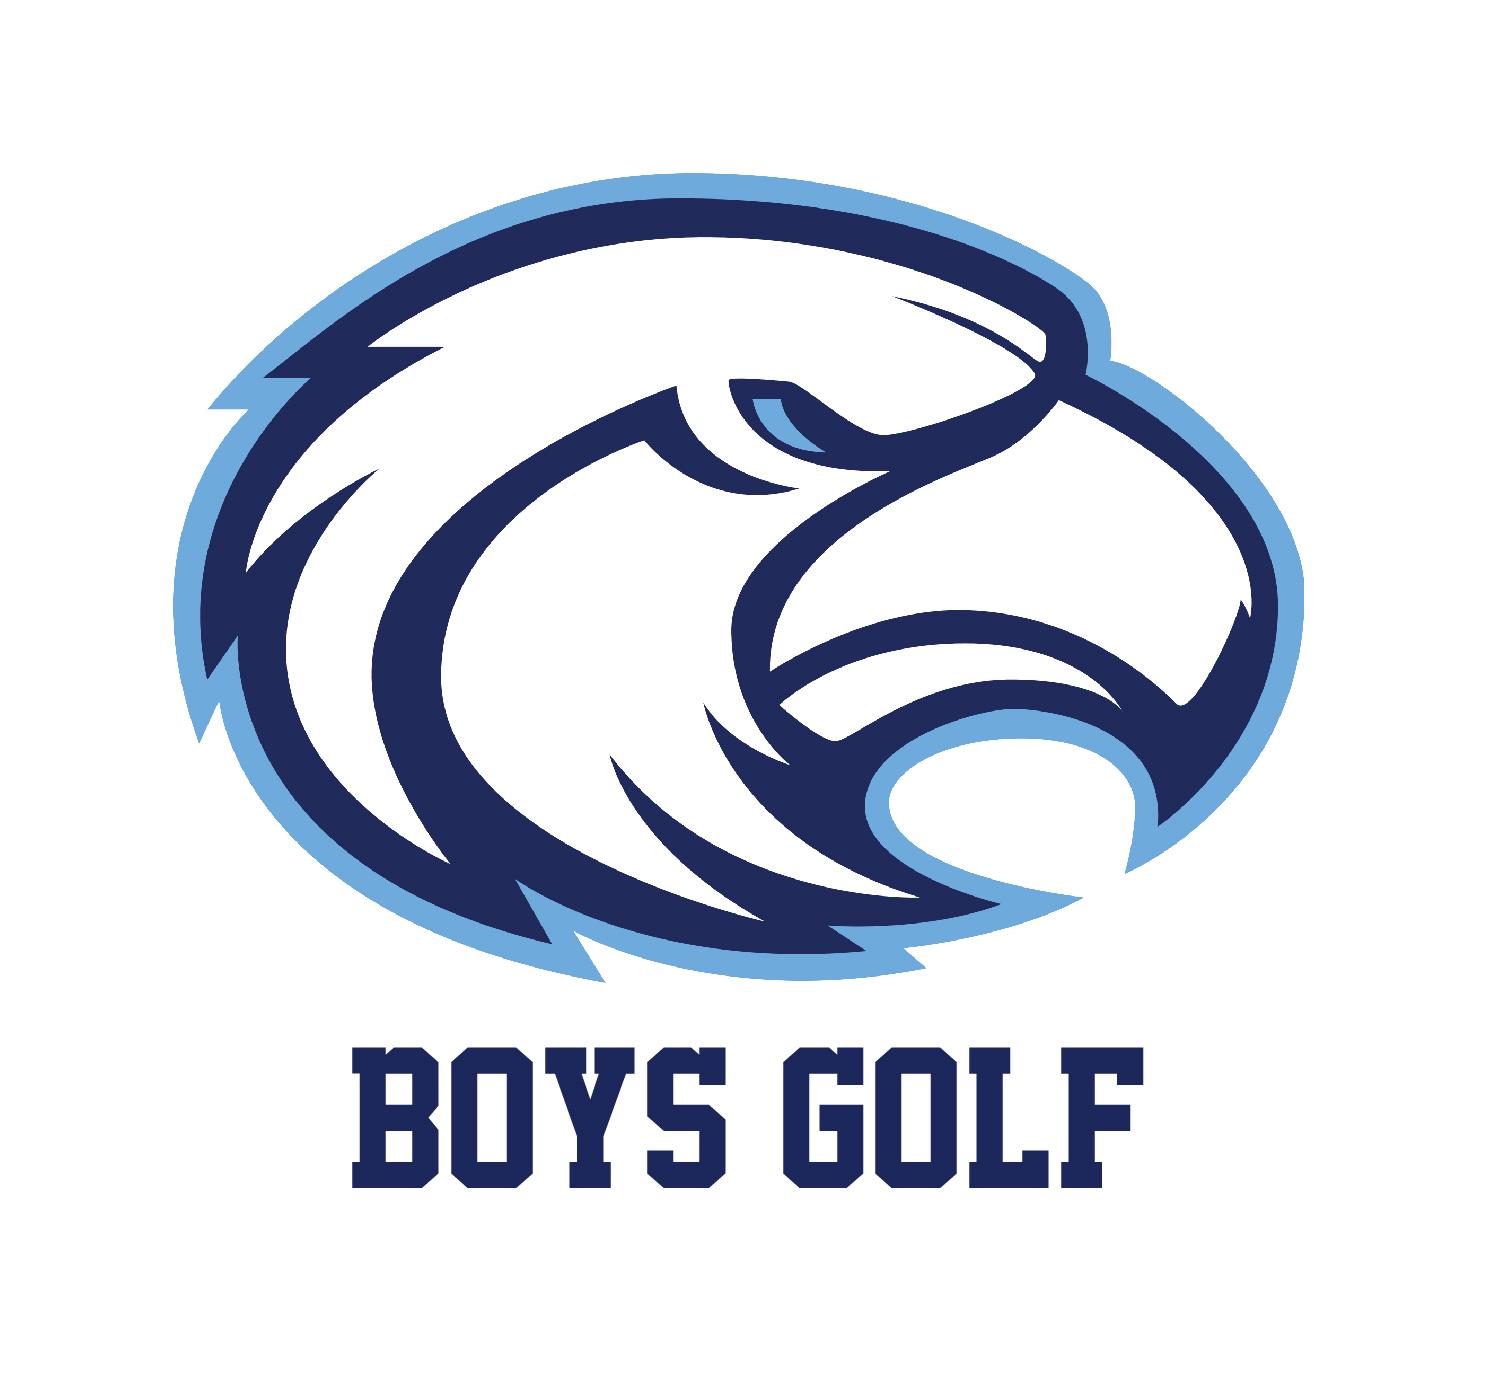 2019 Boys Golf Tryout Information